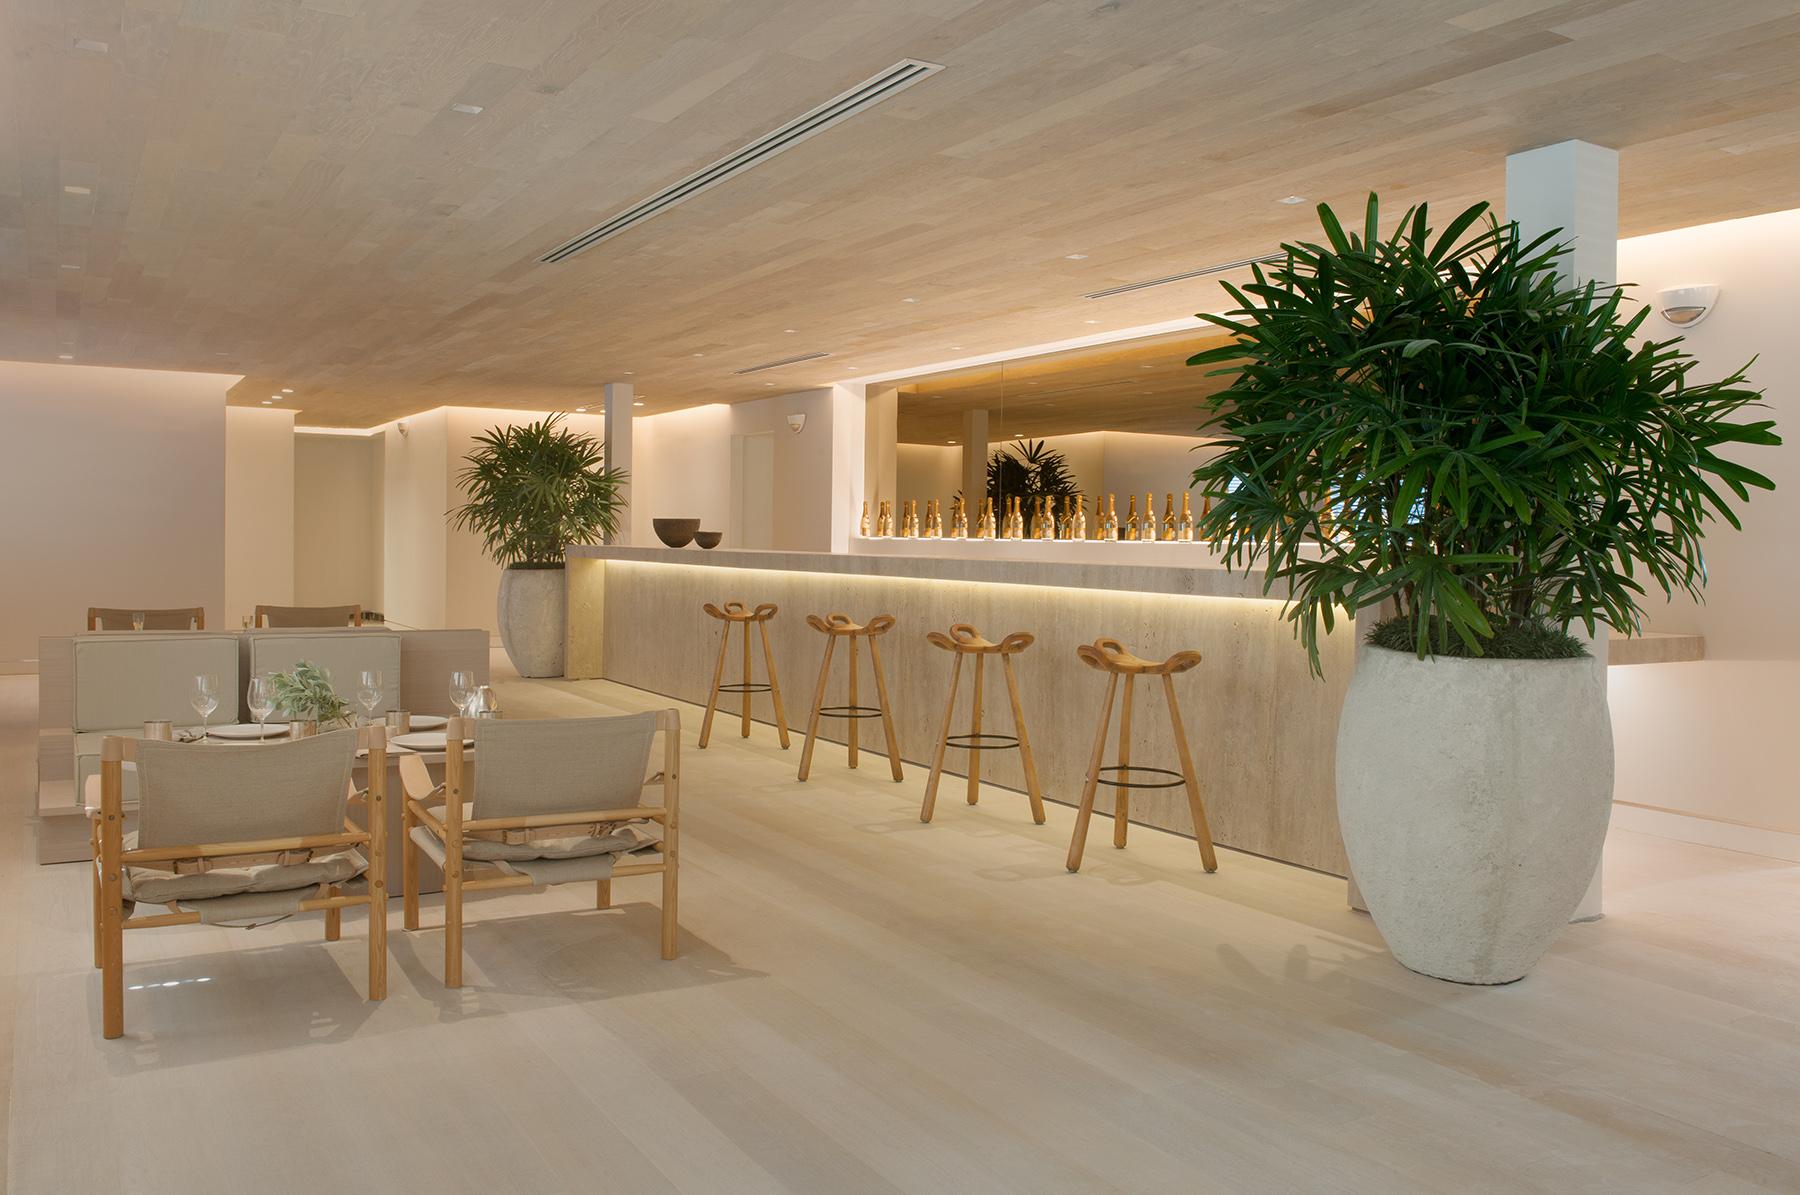 Wonderful Peek Inside The Chad Oppenheim Designed Forte Dei Marmi In Miami Beach